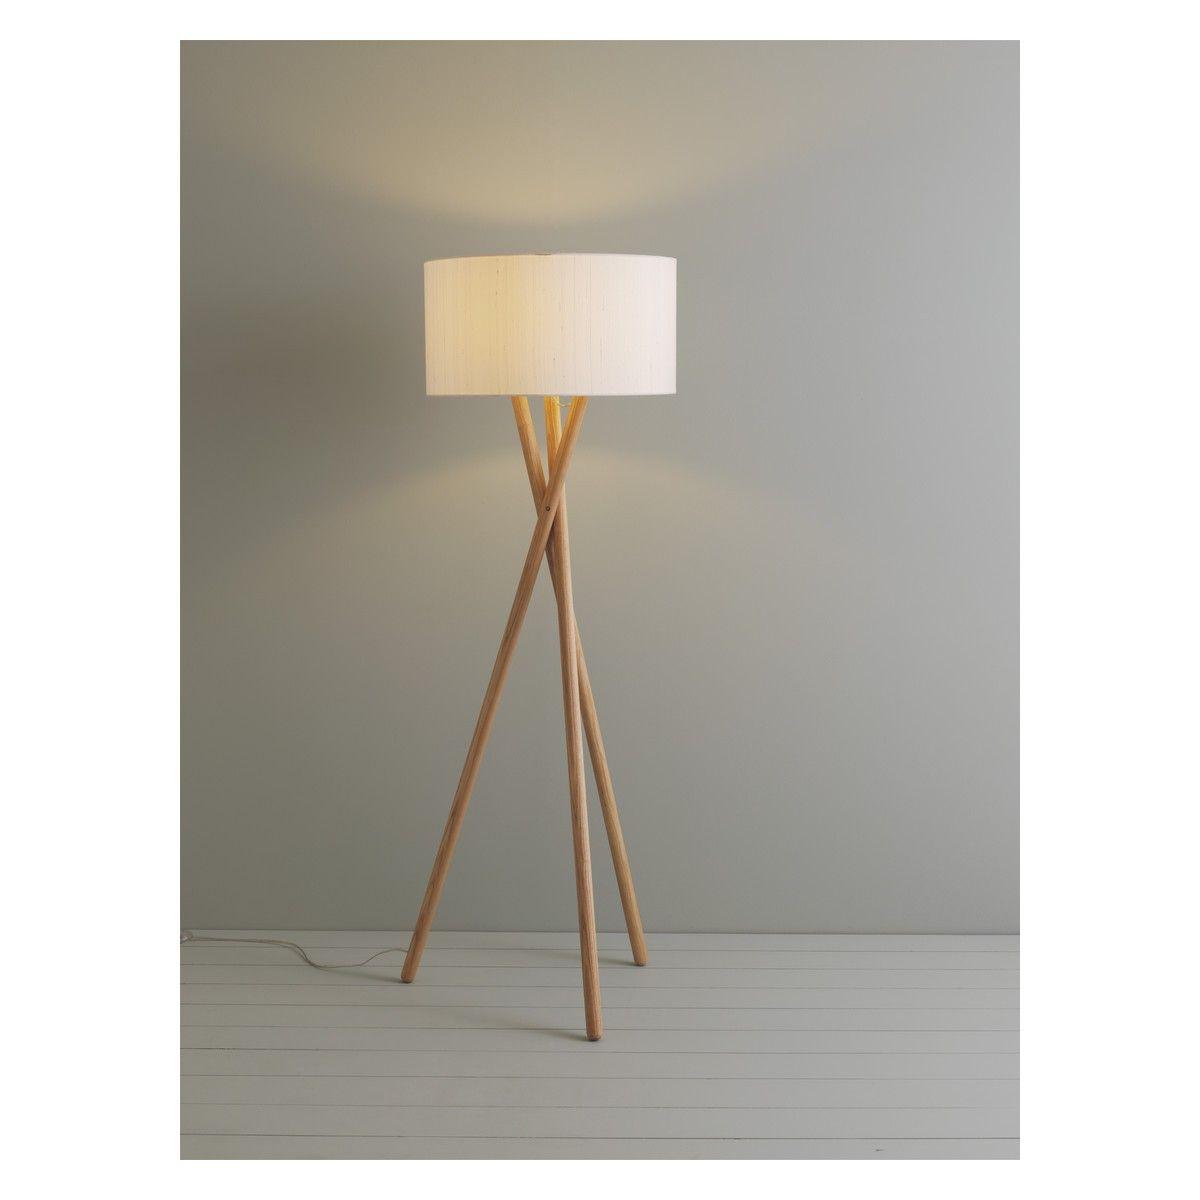 Lansbury Base Ash Wooden Tripod Floor Lamp Wooden Tripod Floor Lamp Floor Lamps Uk Floor Lamps Living Room